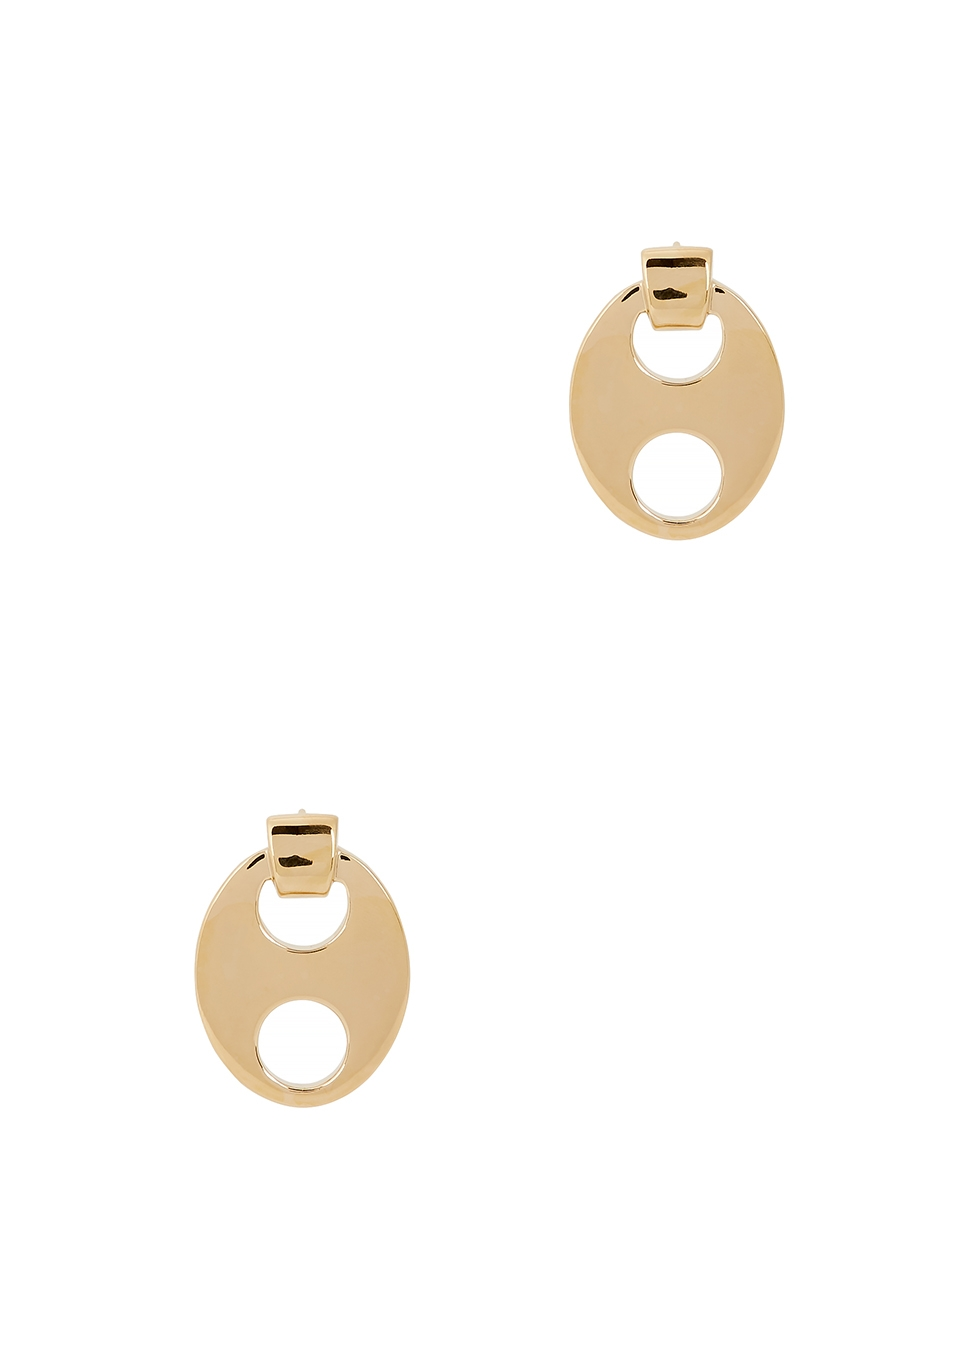 Eight gold-tone stud earrings